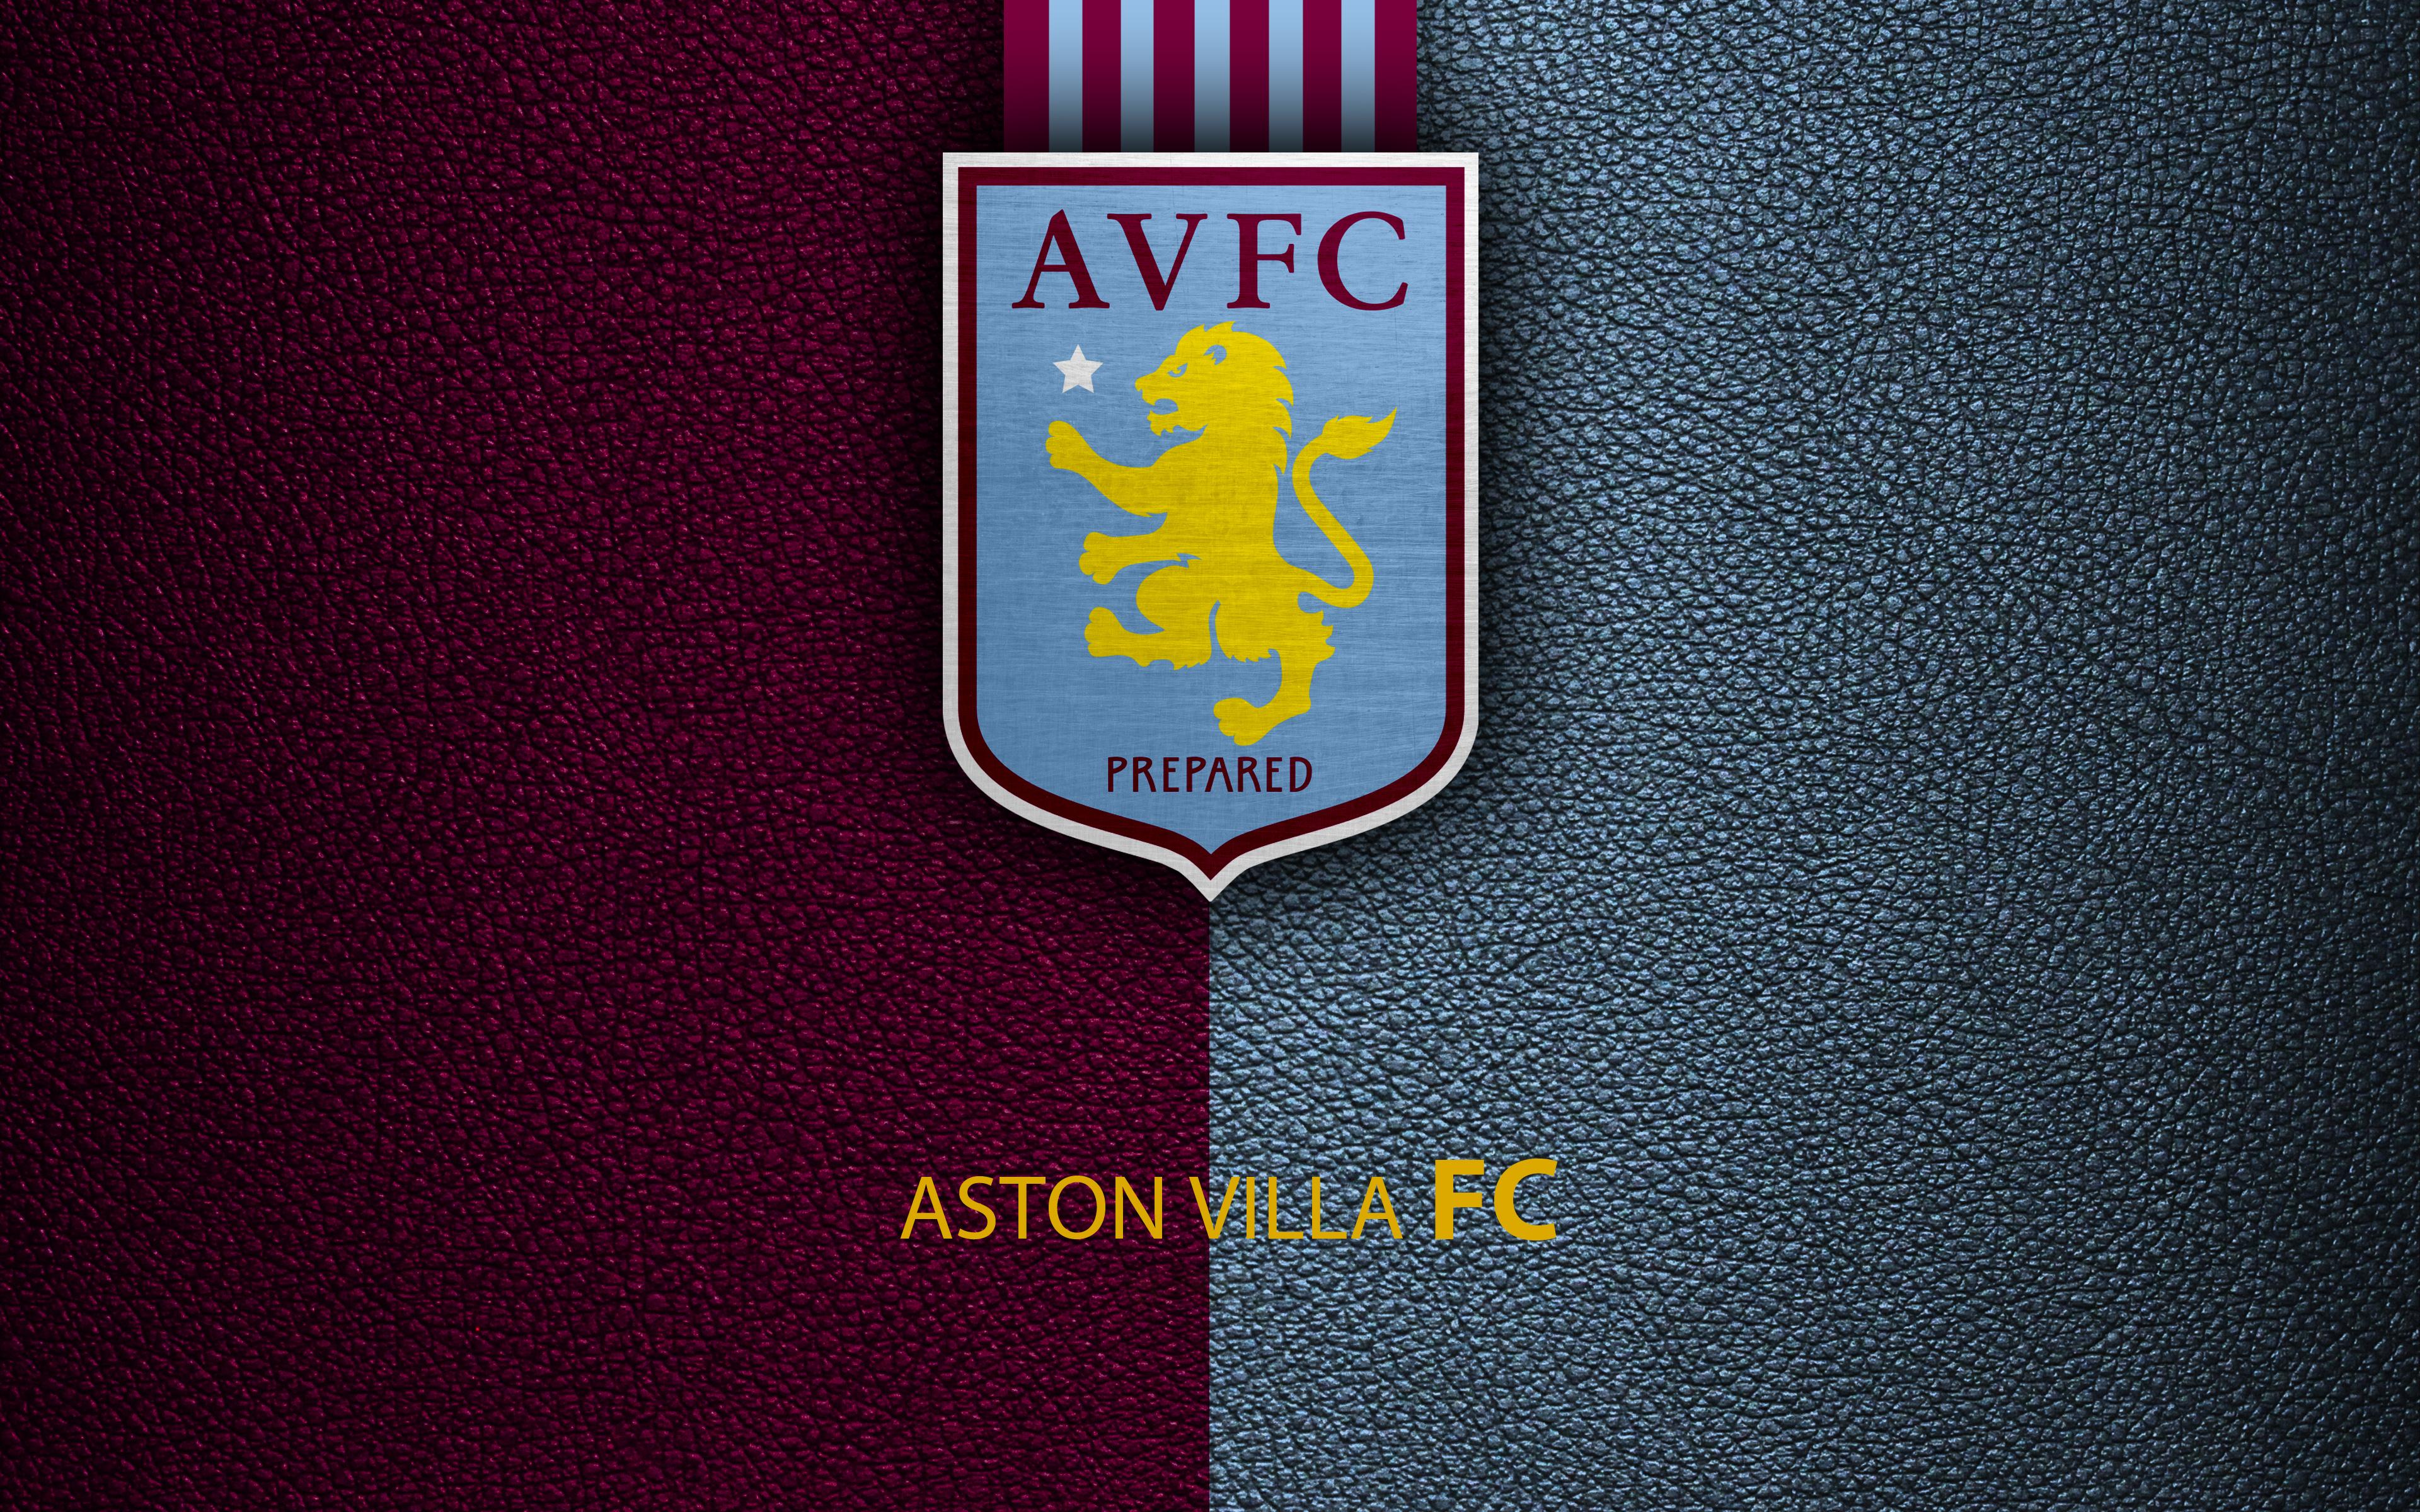 Aston Villa F.C. 4k Ultra HD Wallpaper